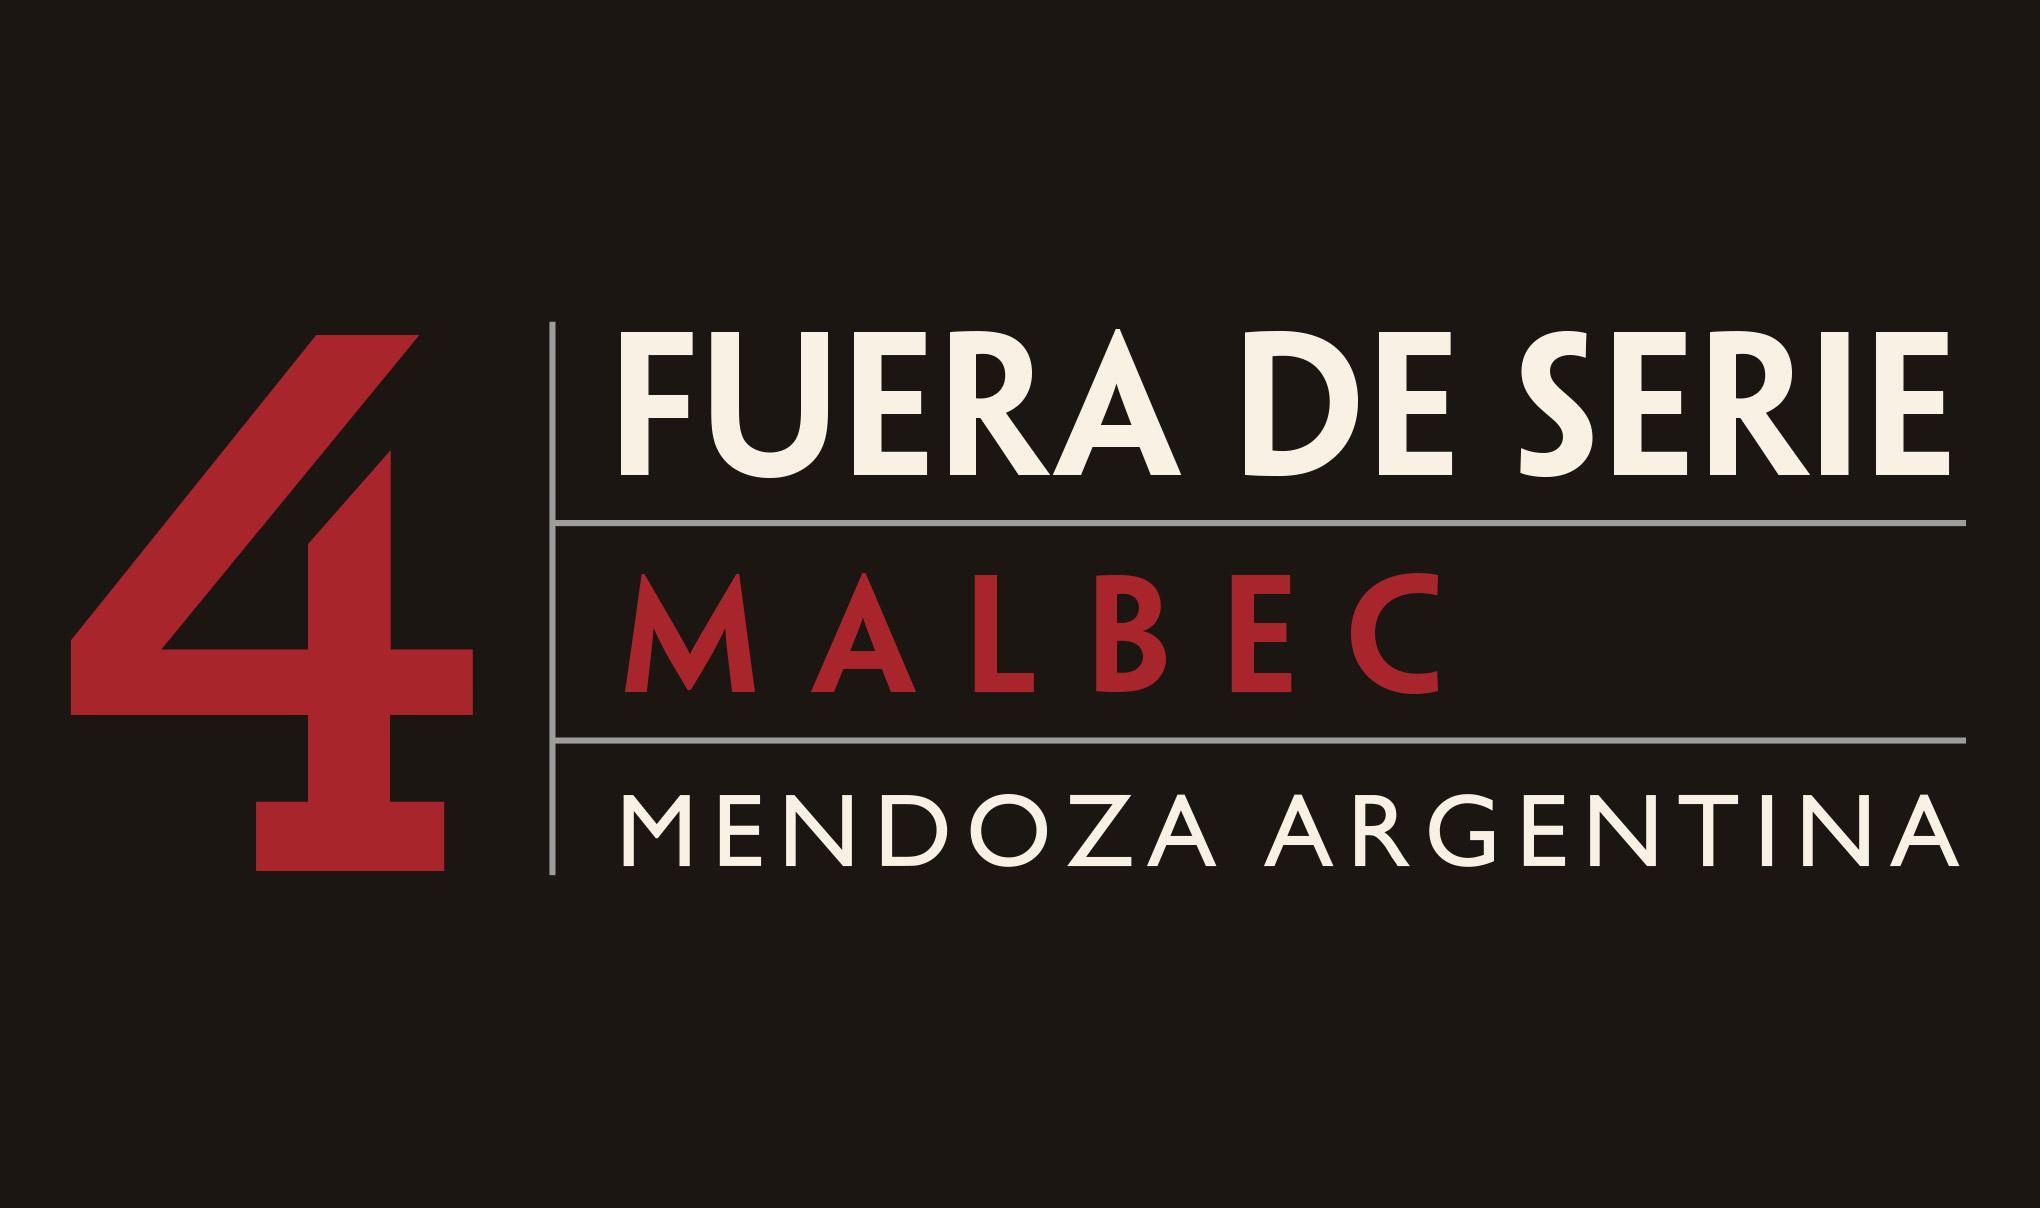 Fuera De Serie wine label tab - Malbec